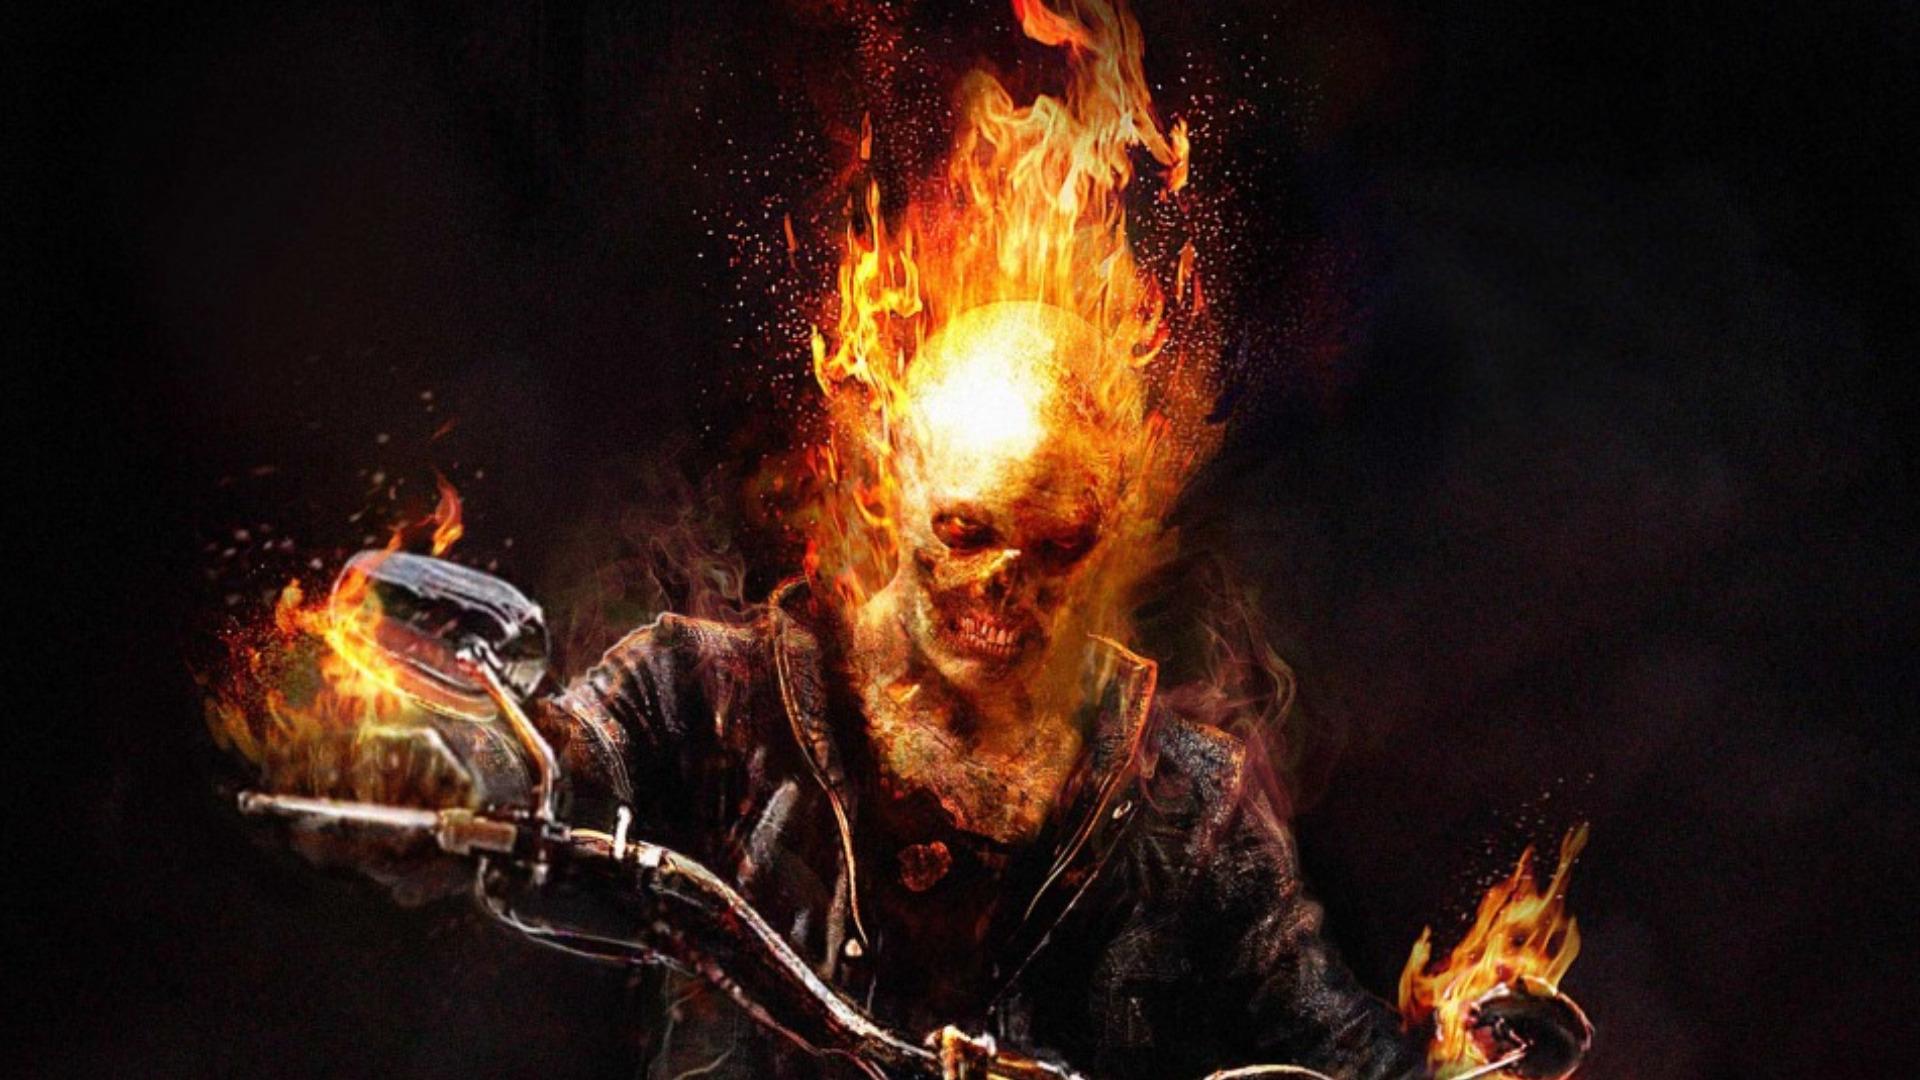 Ghost Rider Wallpaper Ghost Rider Spirit Of Vengeance User 1920x1080